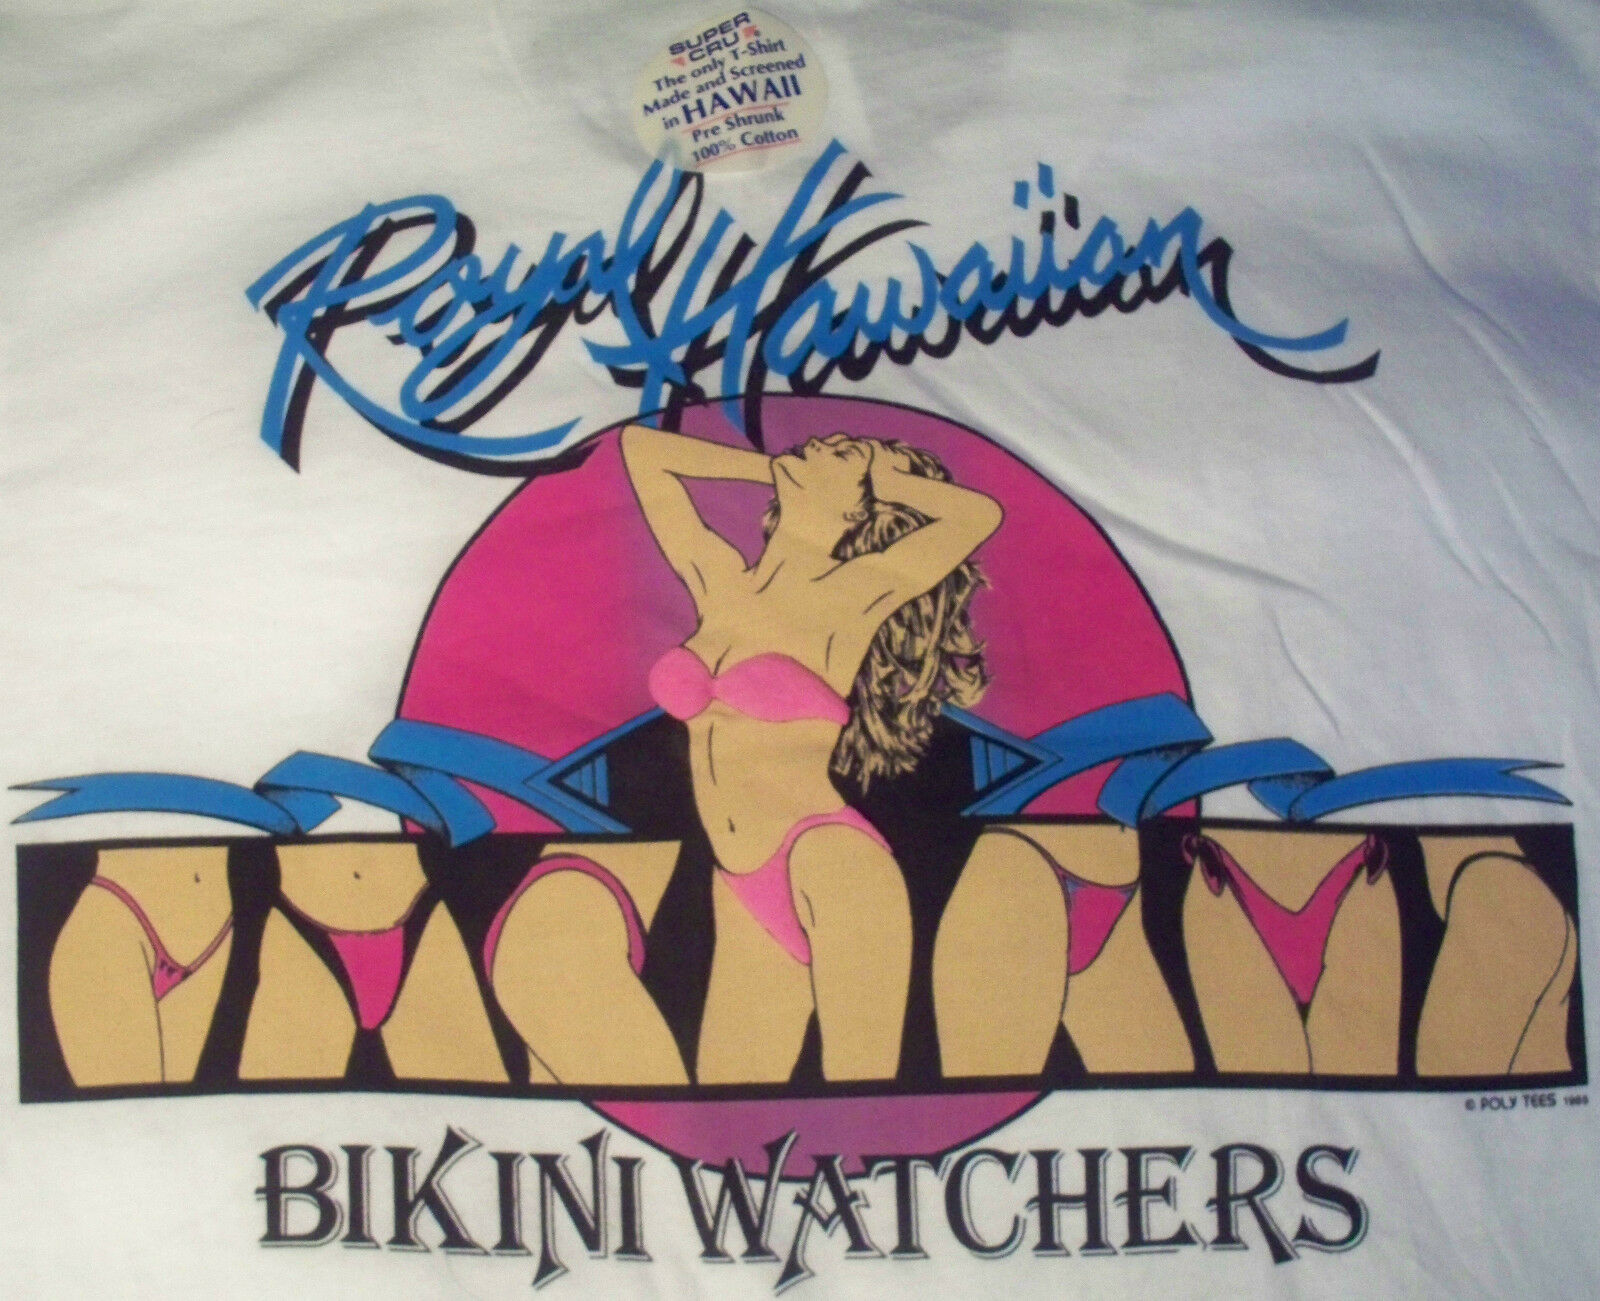 Royal Hawaiian Bikini Watchers vtg t shirt Member 1985 UNUSED mens size XL